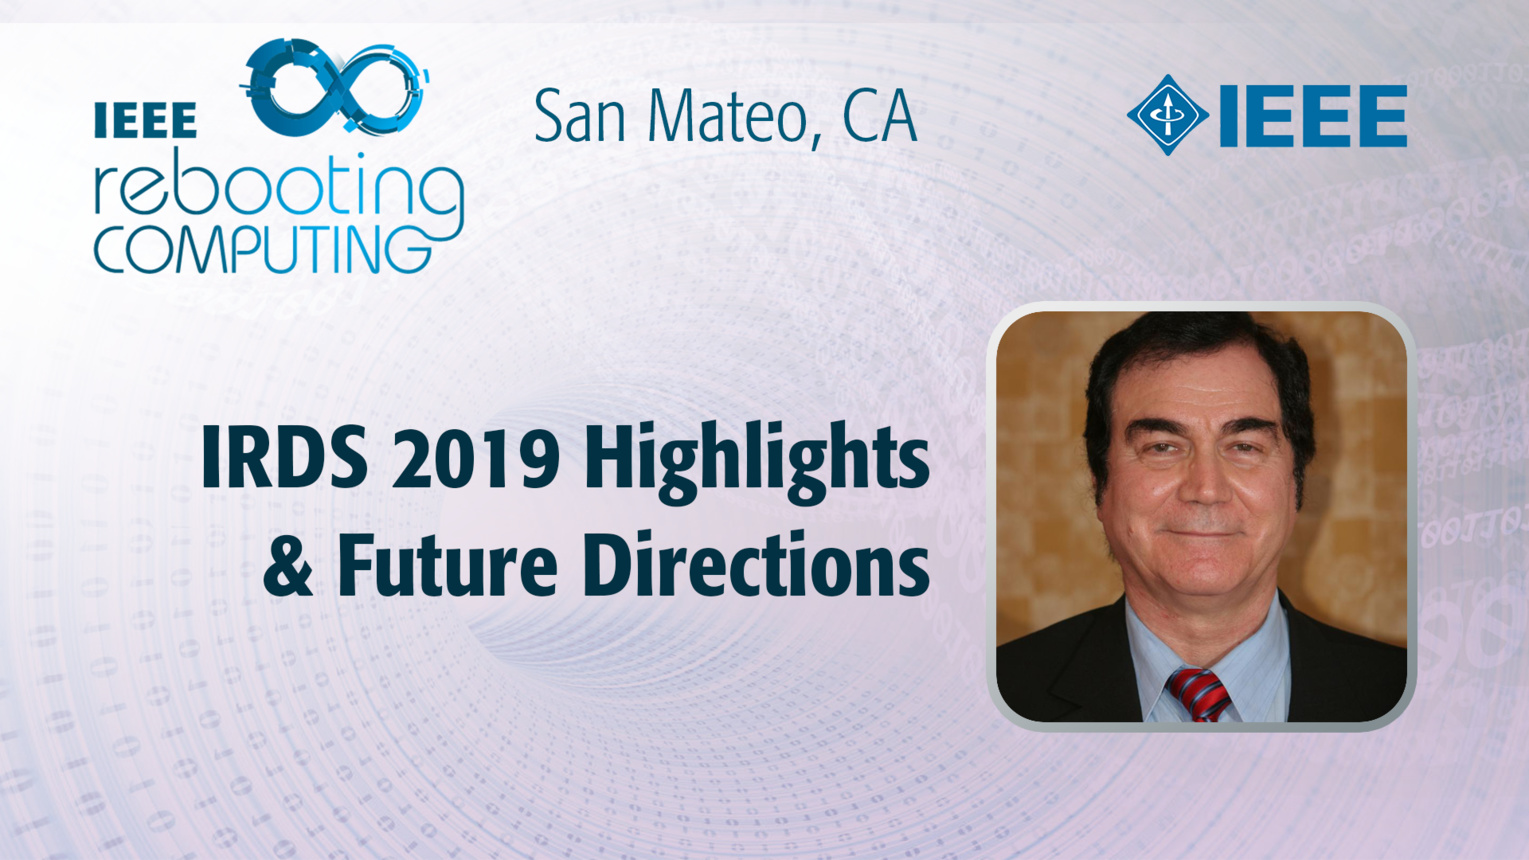 IRDS Highlights & Future Directions - Paolo Gargini - ICRC San Mateo, 2019